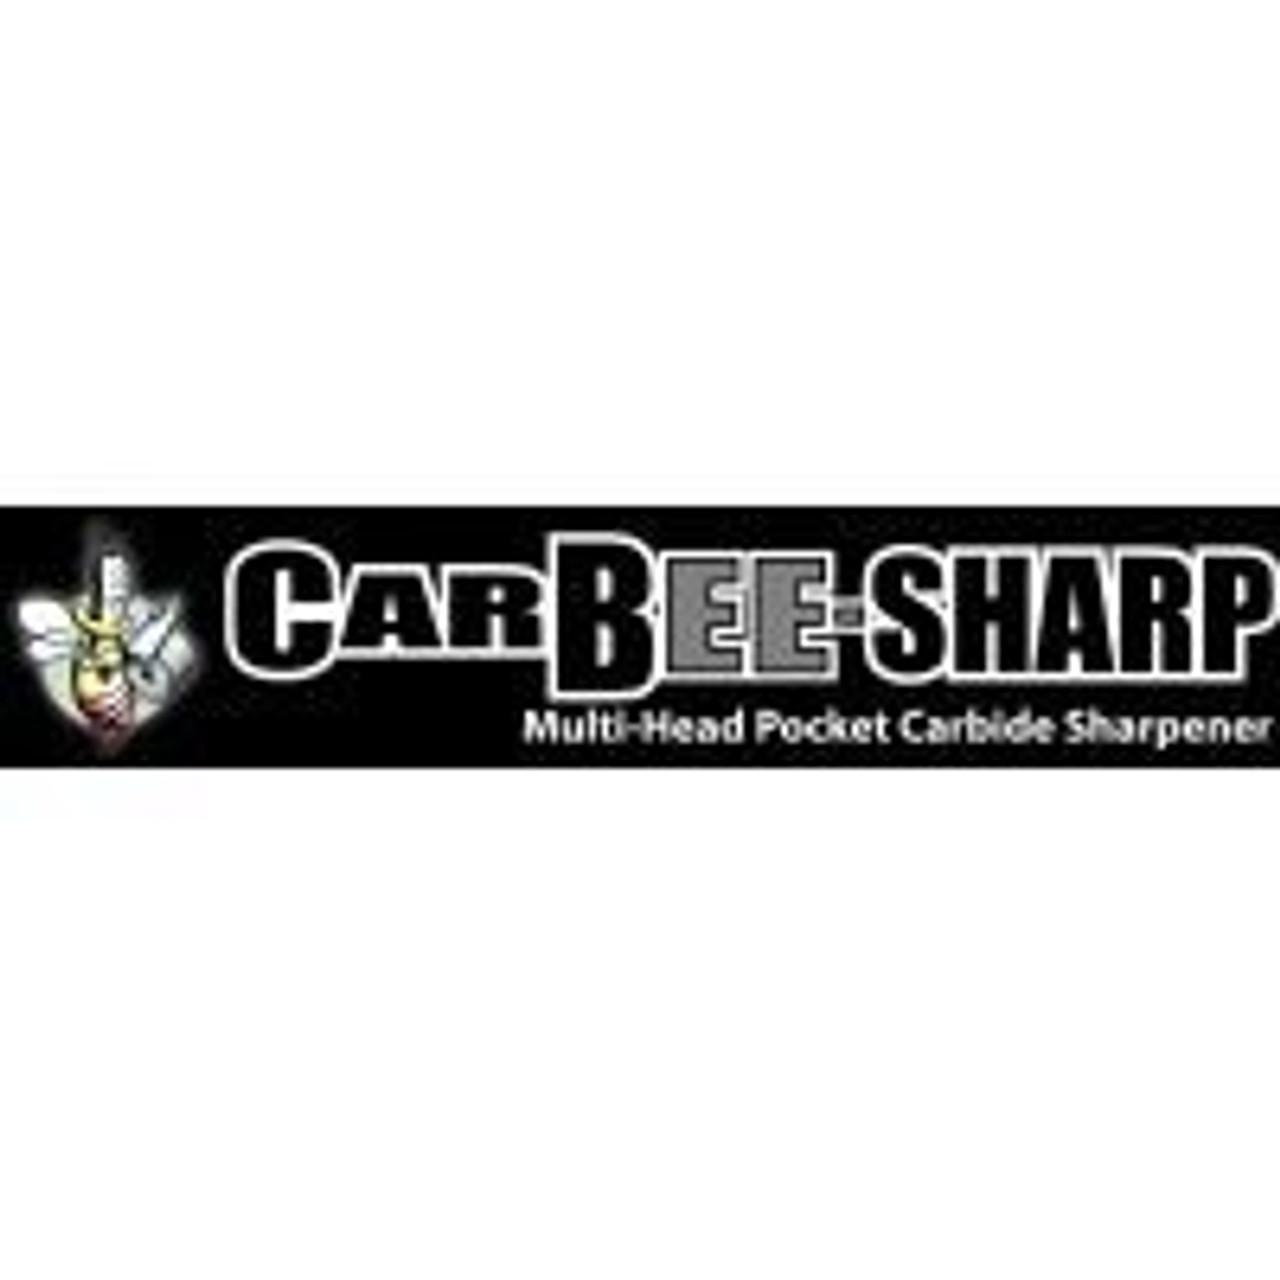 CarBee-Sharp